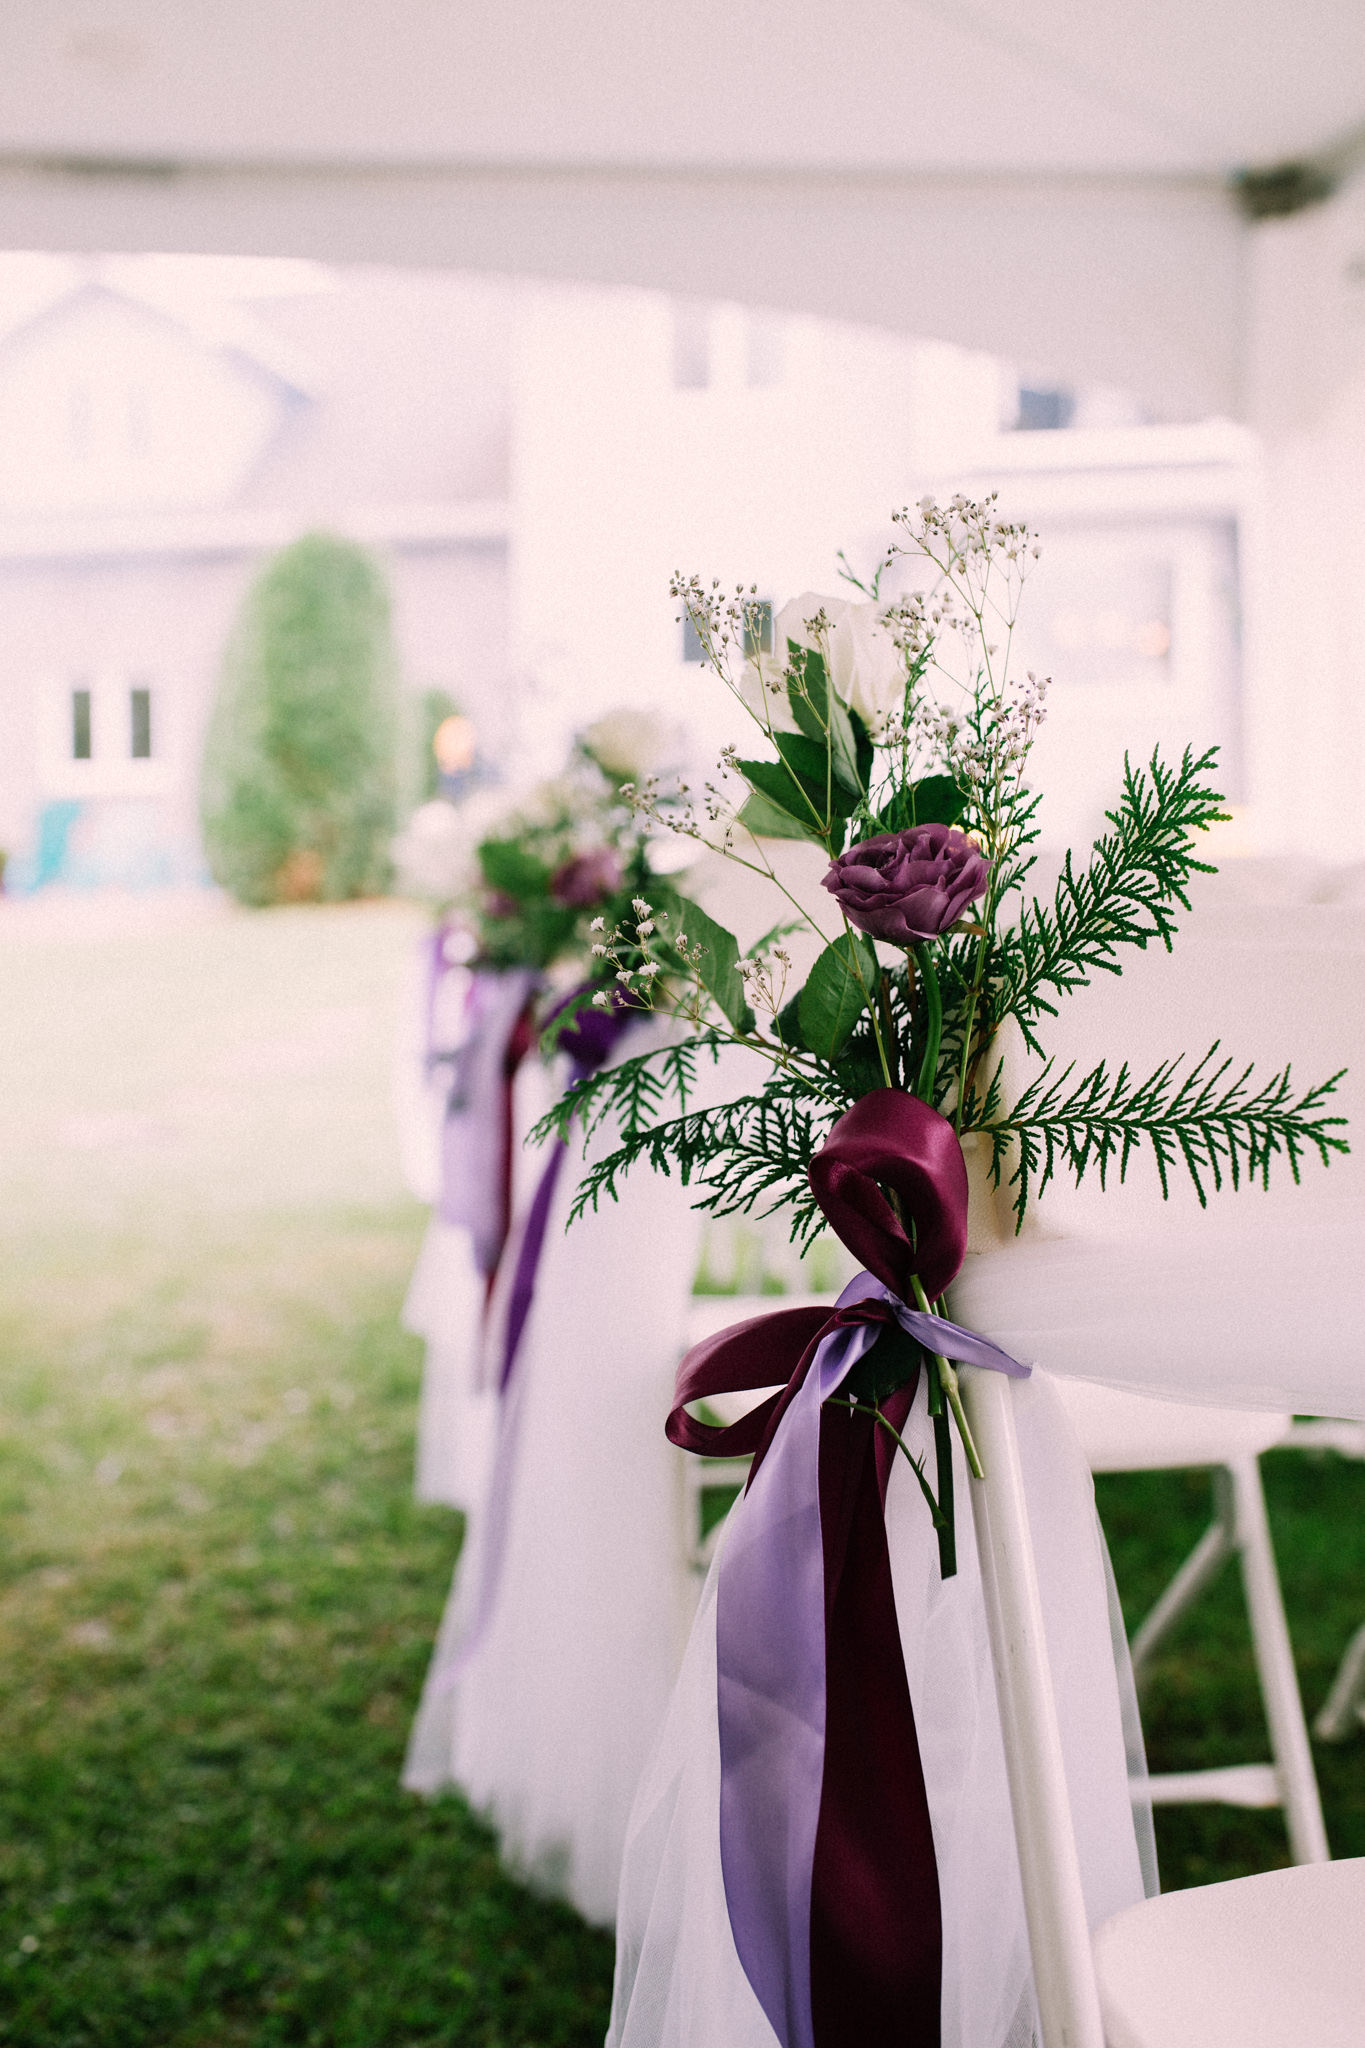 Backyard wedding in Brechin by Max Wong Photo (4)